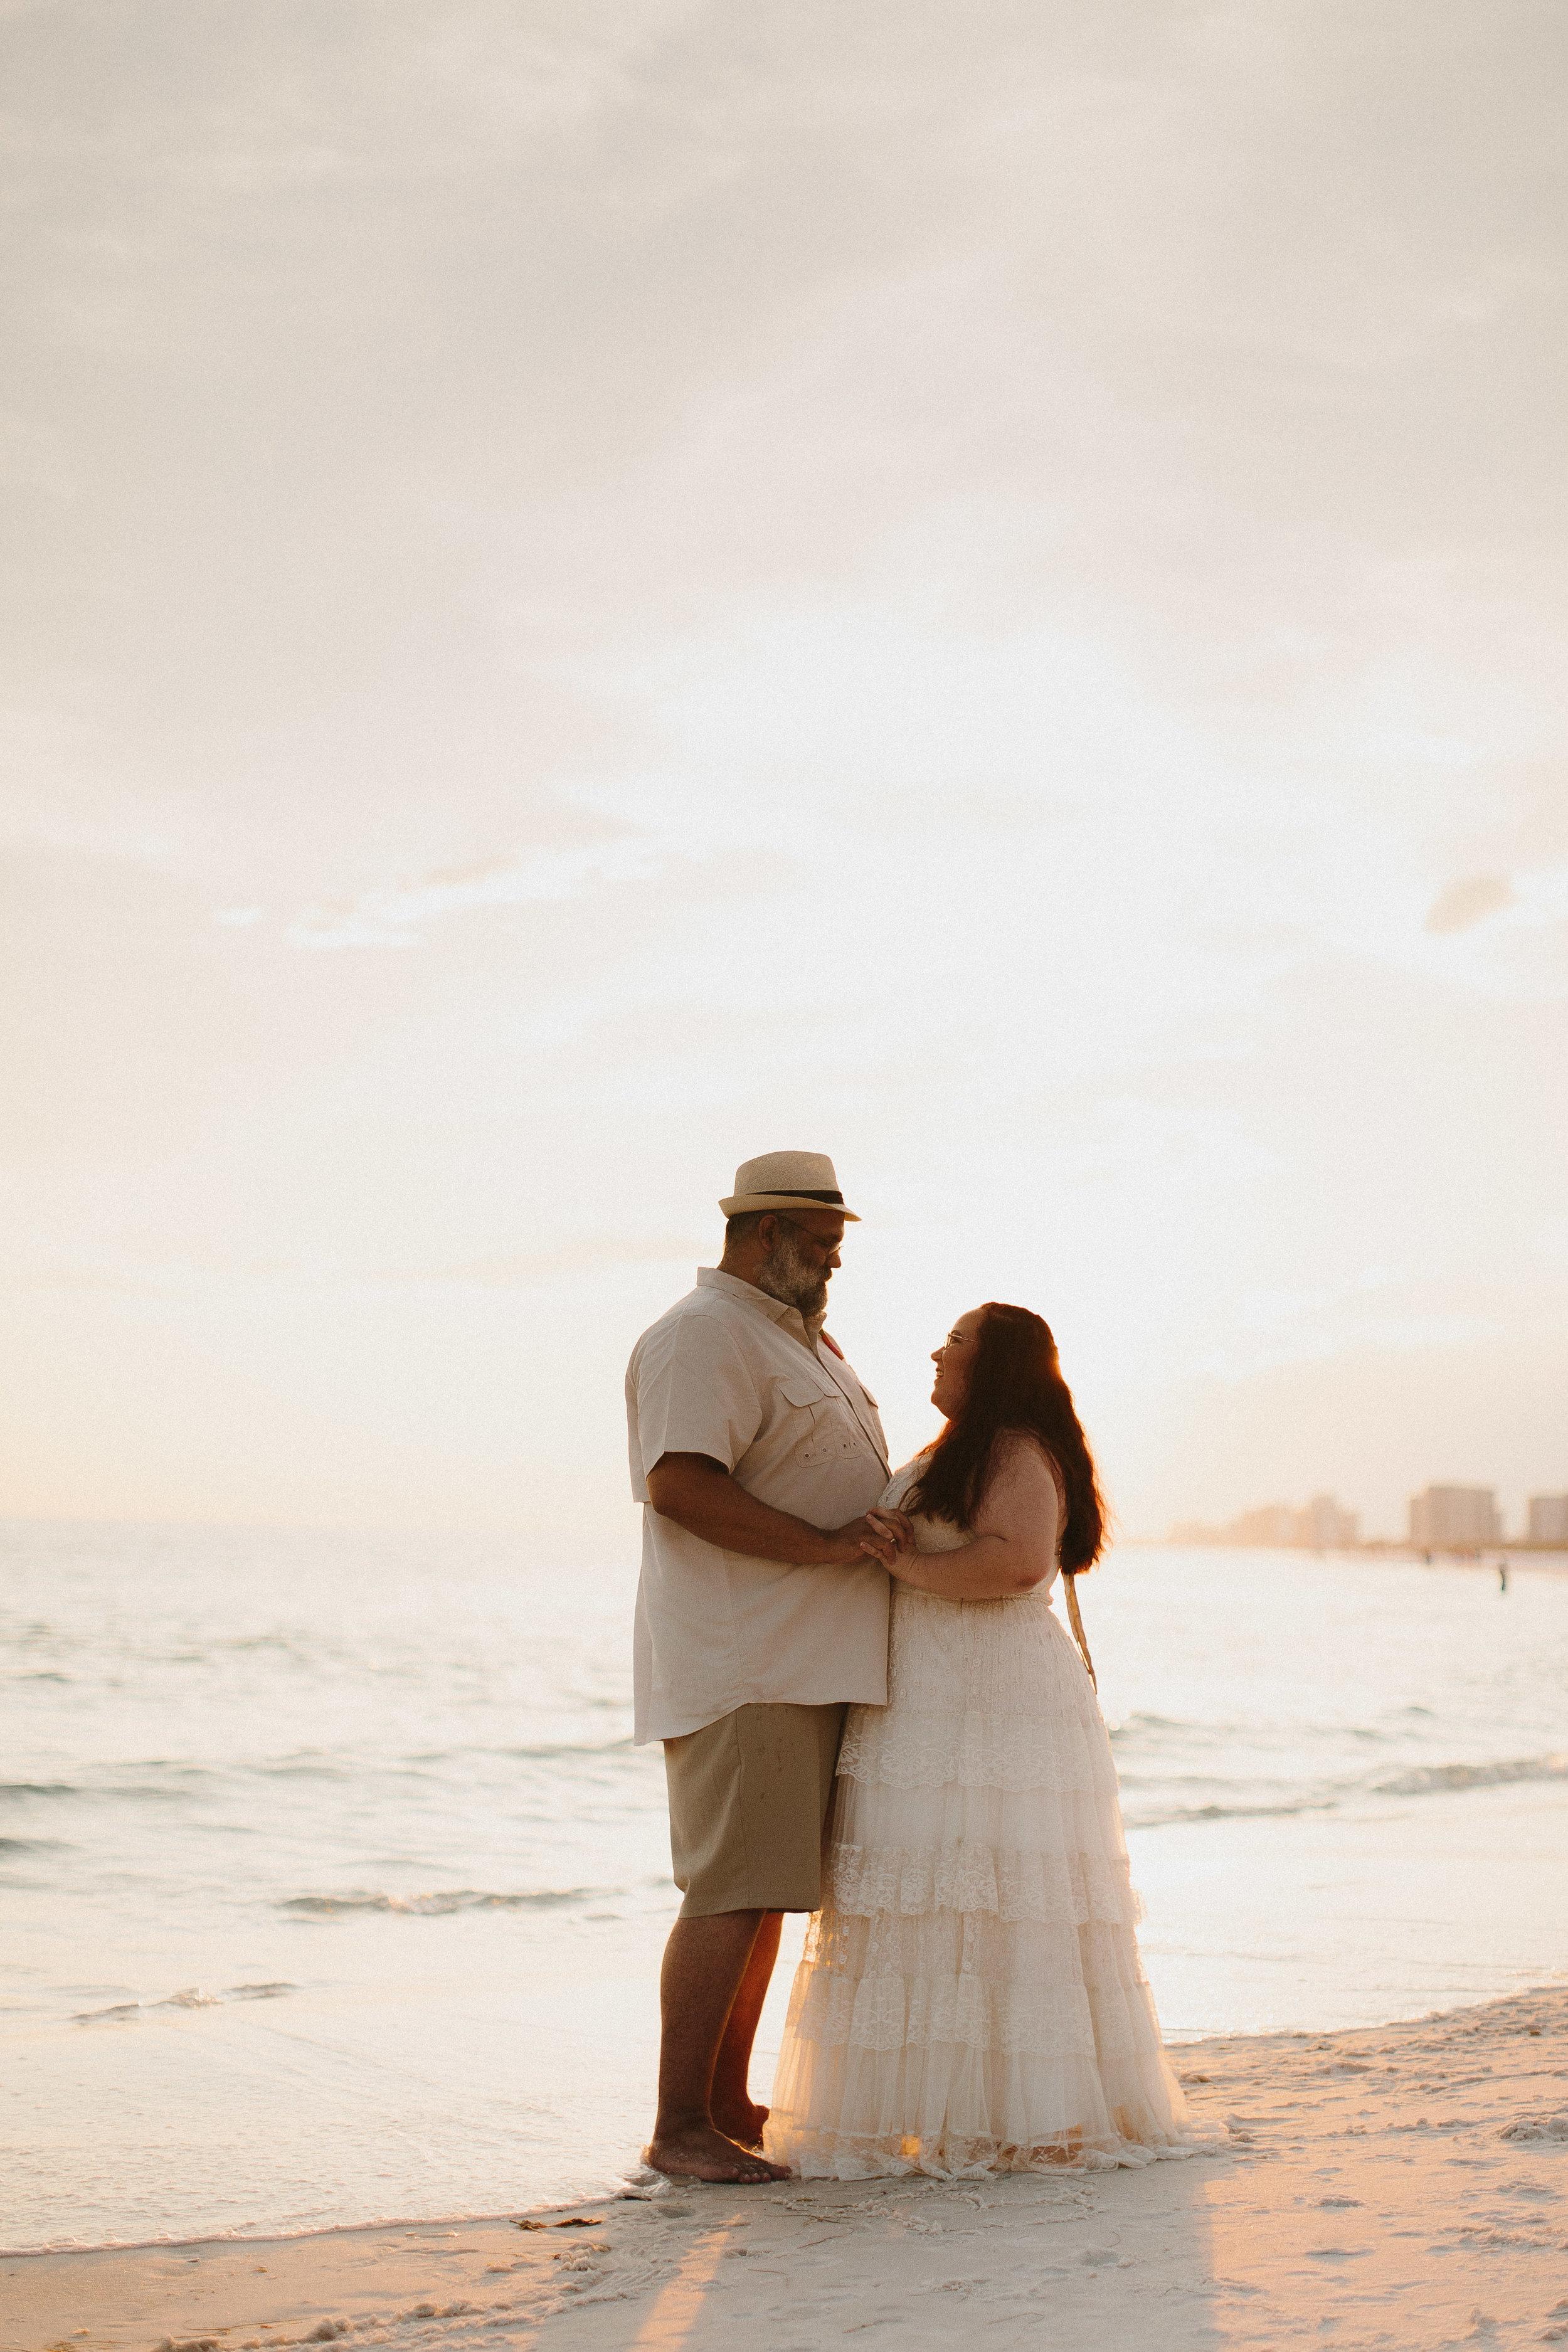 destin_sunset_beach_elopement_intimate_wedding_photographer_florida_documentary_1307.jpg